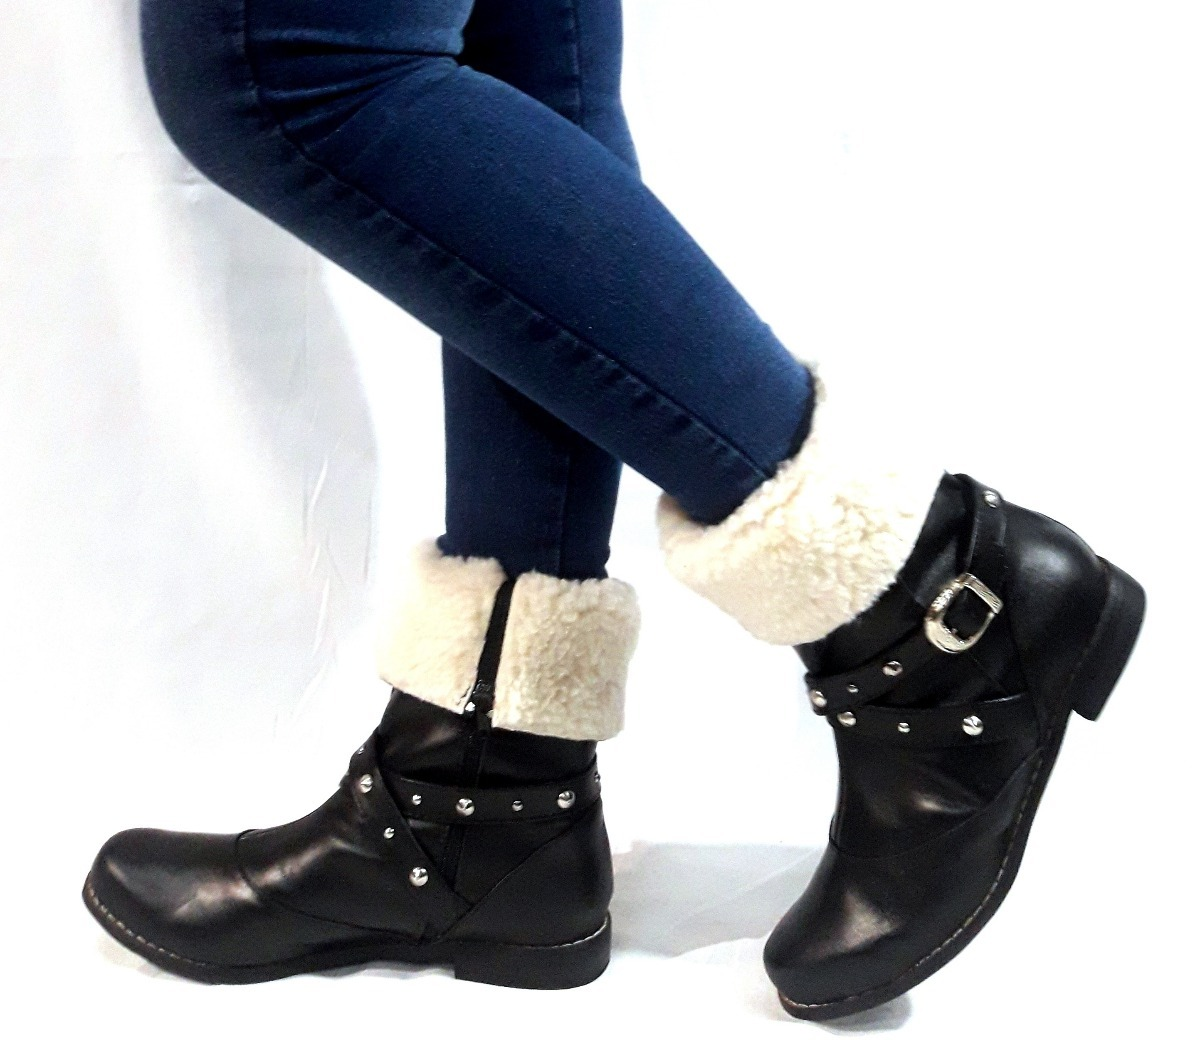 cfd54f5a4 sam123 botas cortas mujer talle grande oferta 016cor negras. Cargando zoom.